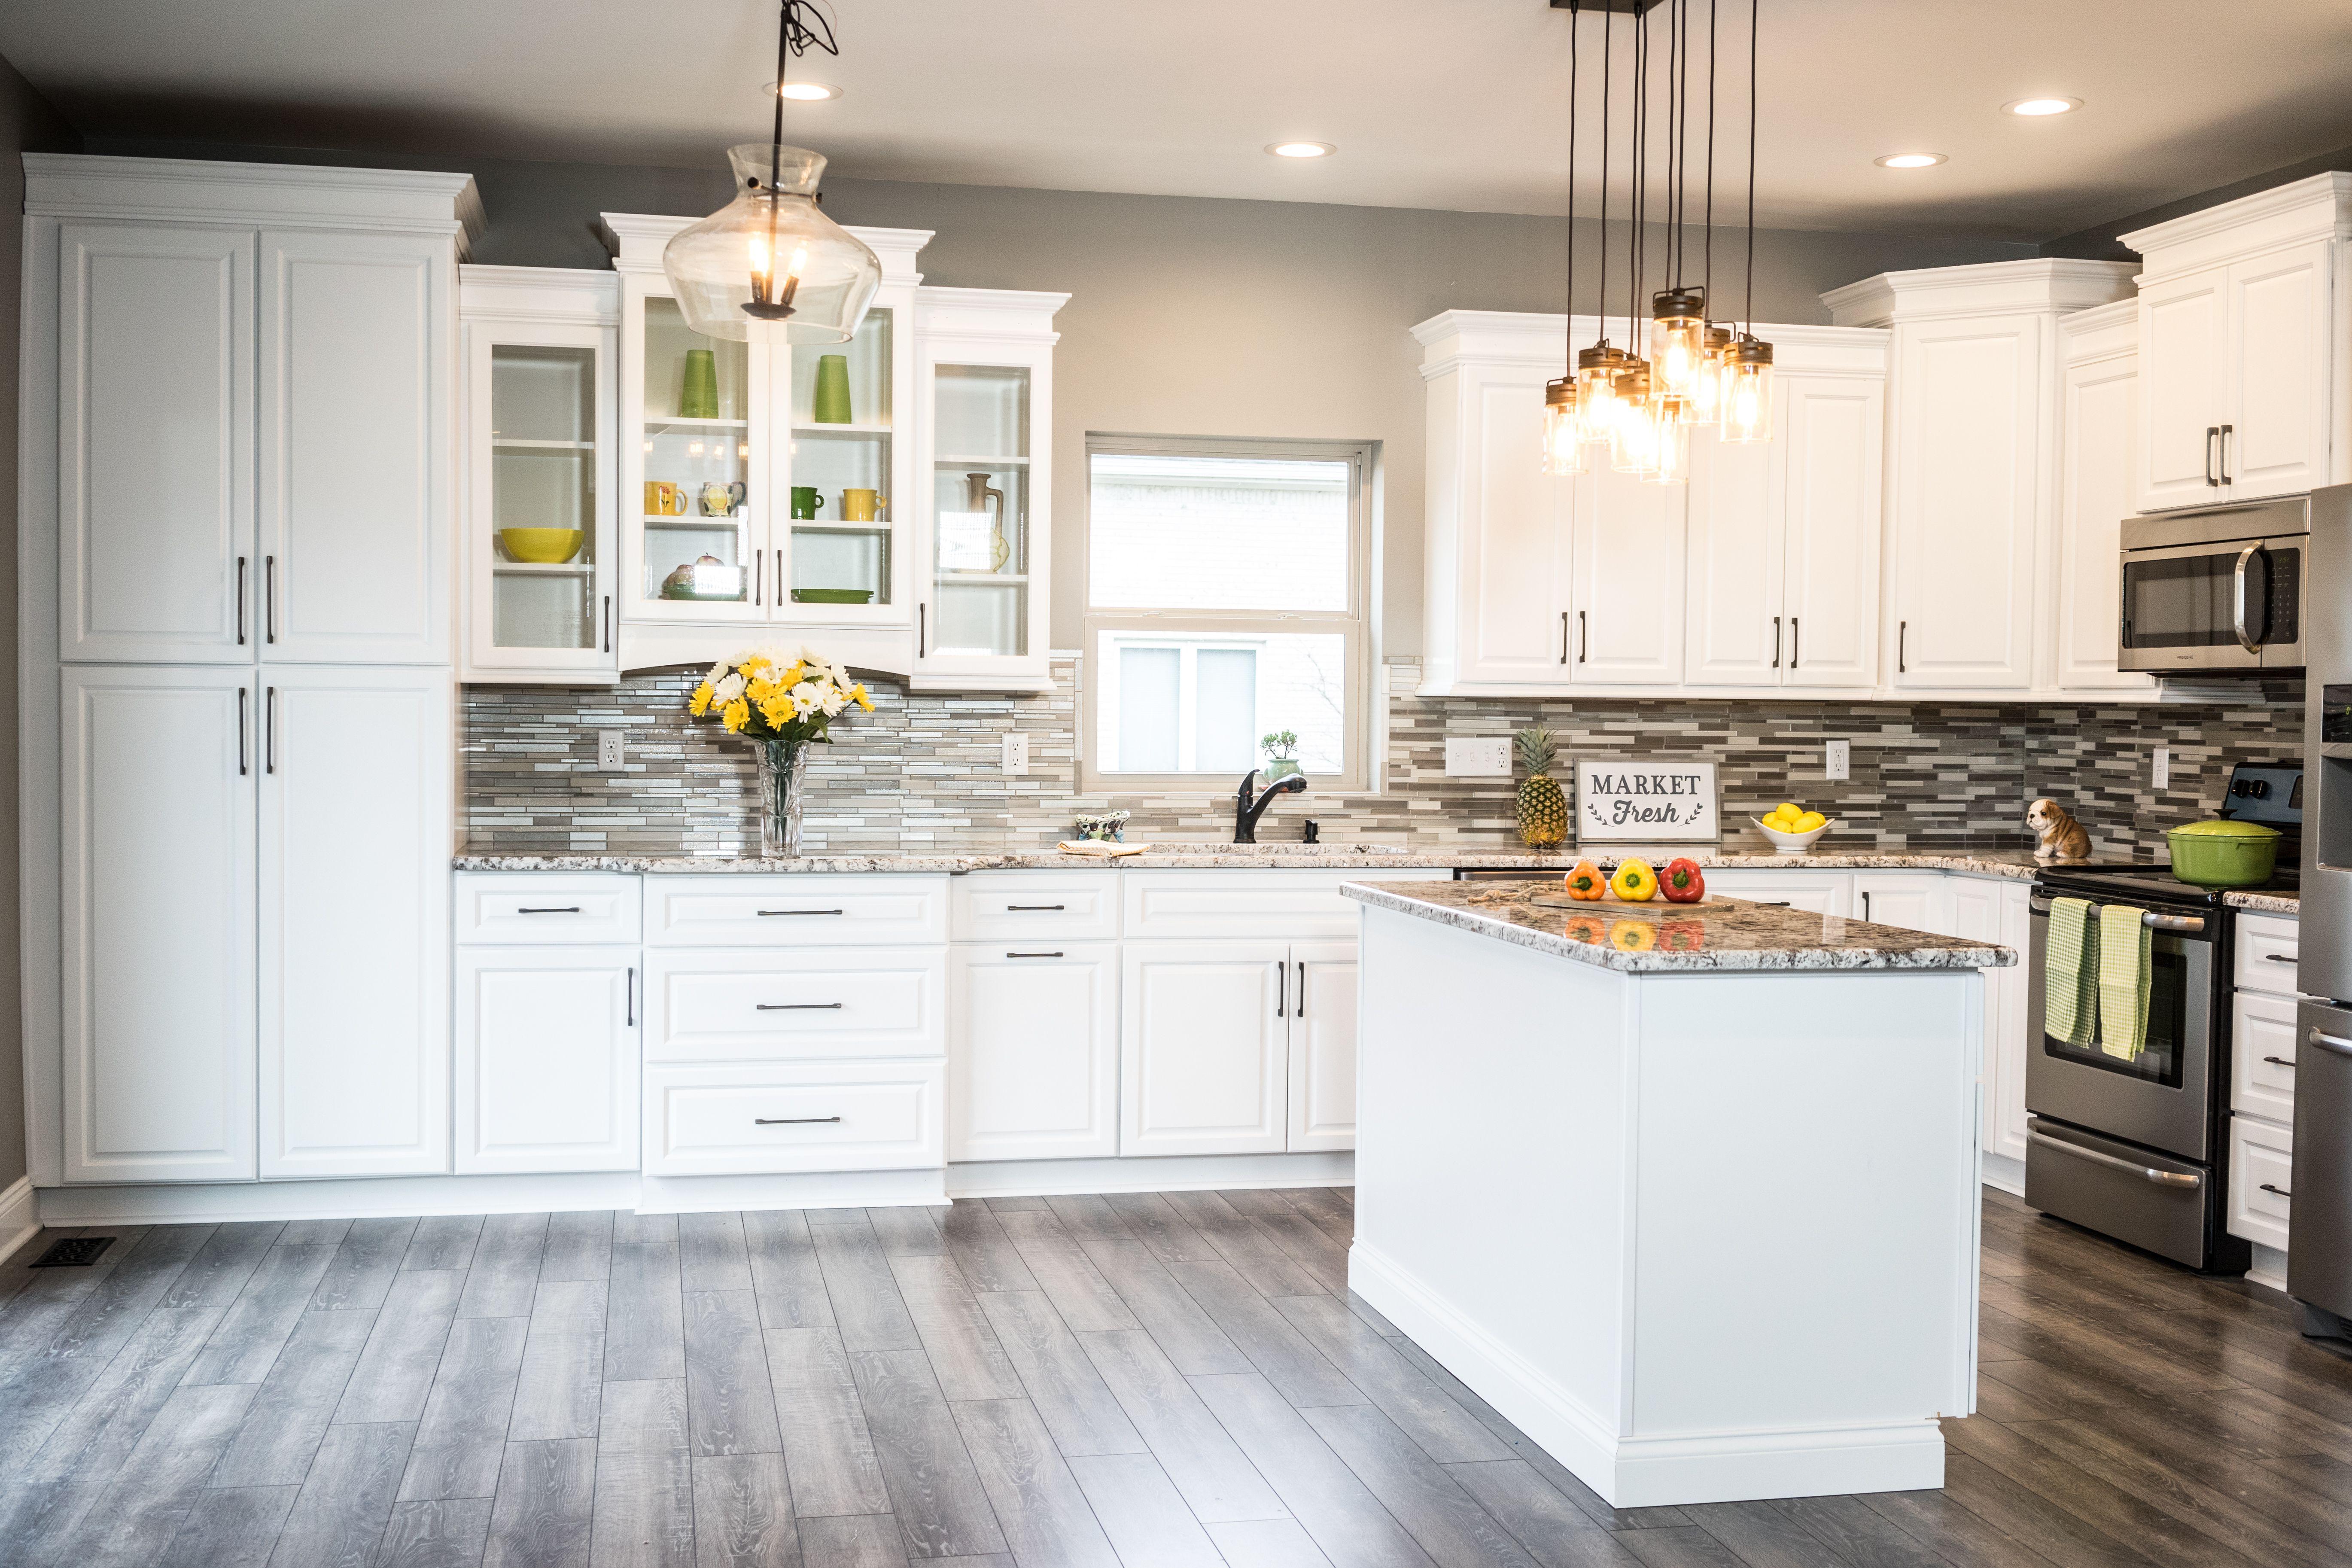 Pin by Zanetta Brown on Somene\'s in the Kitchen.... | White ...